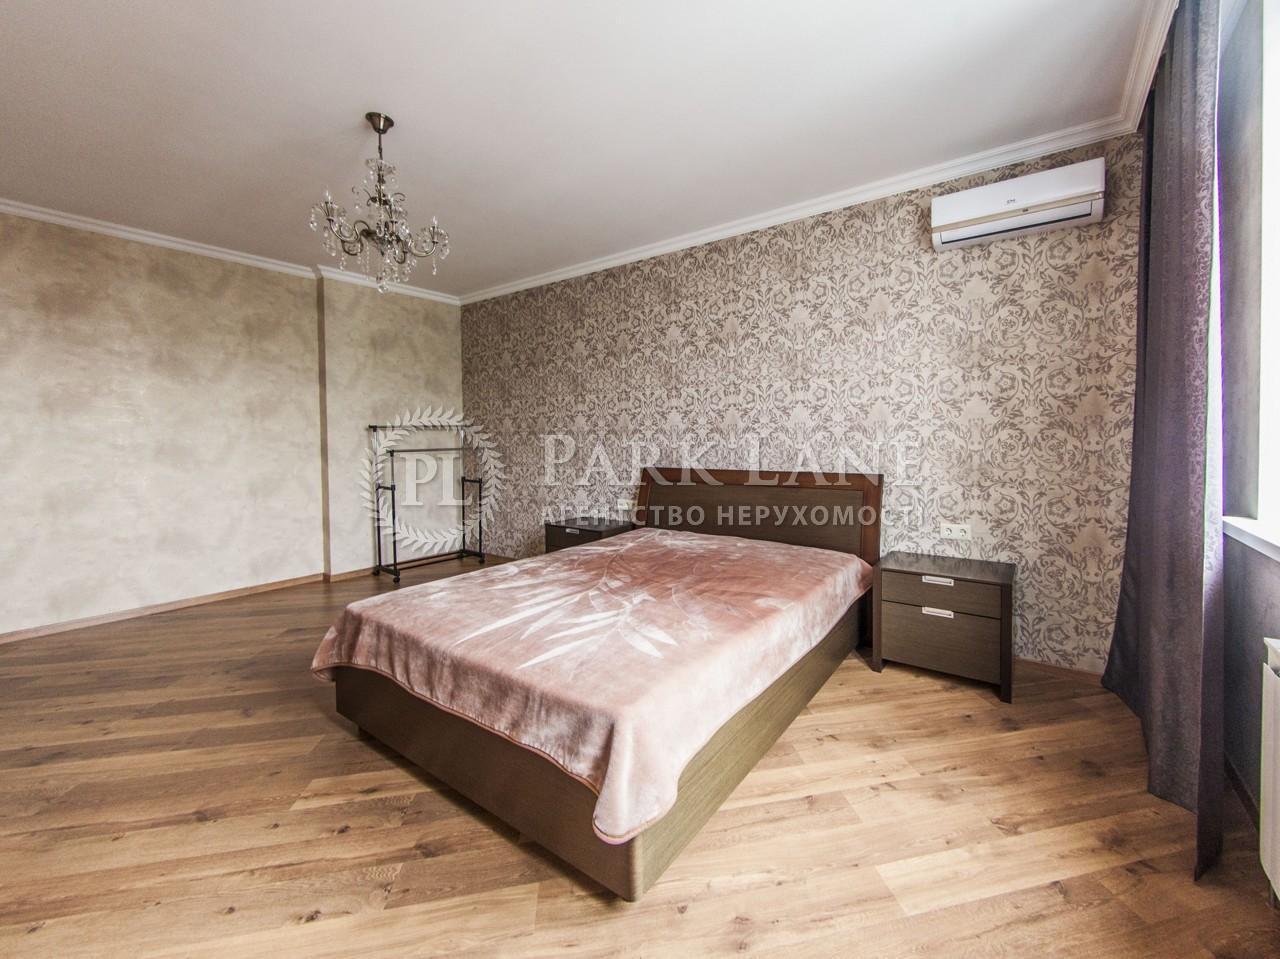 Квартира K-21799, Чавдар Елизаветы, 5, Киев - Фото 8